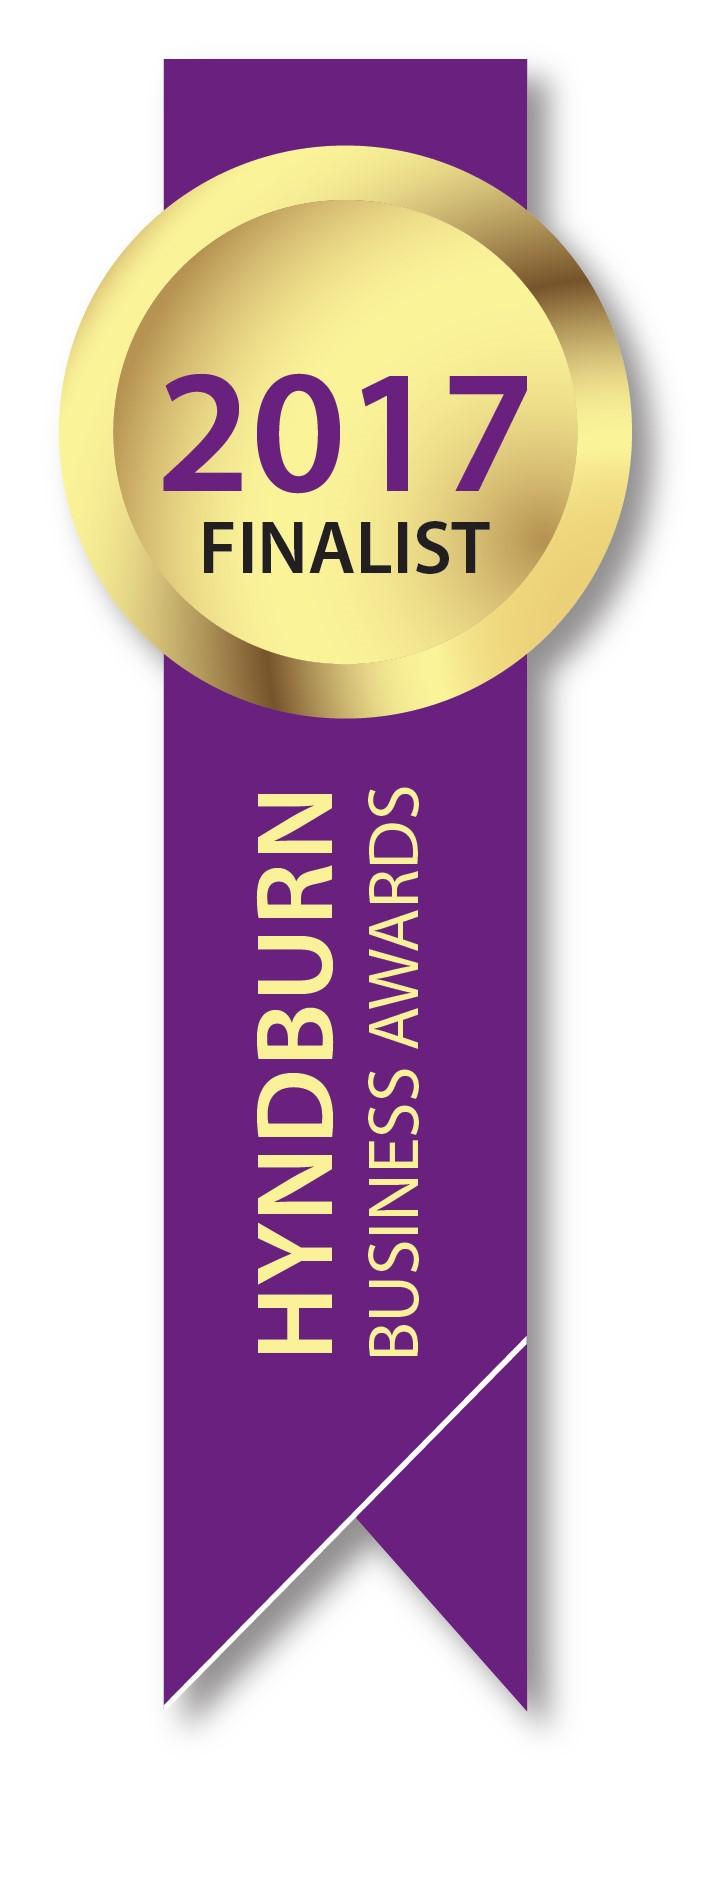 Hyndburn Busines Awards Finalist